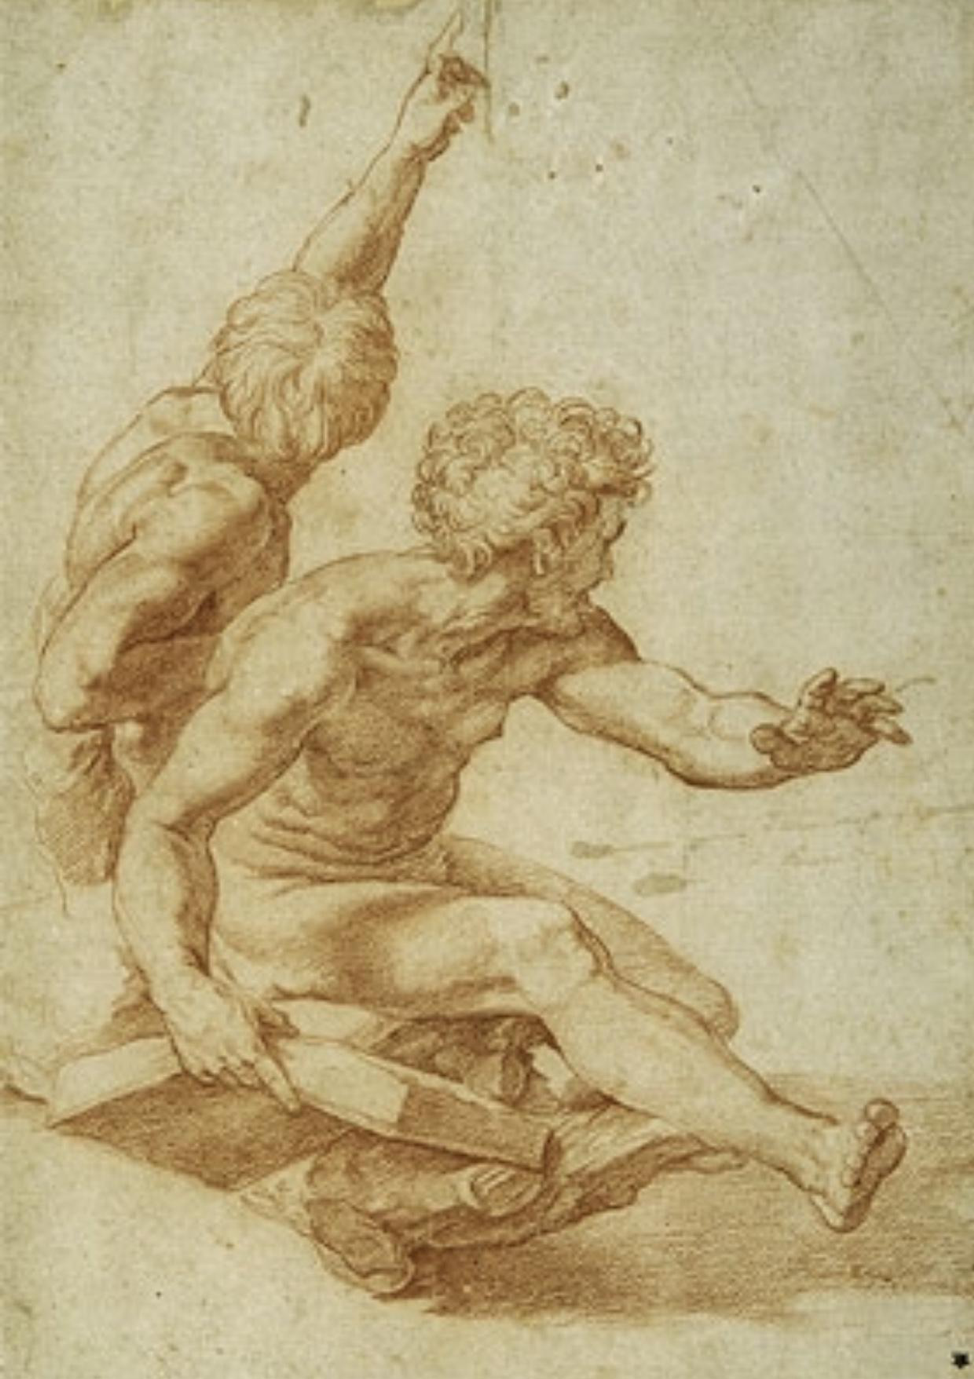 Omiros, Raphael